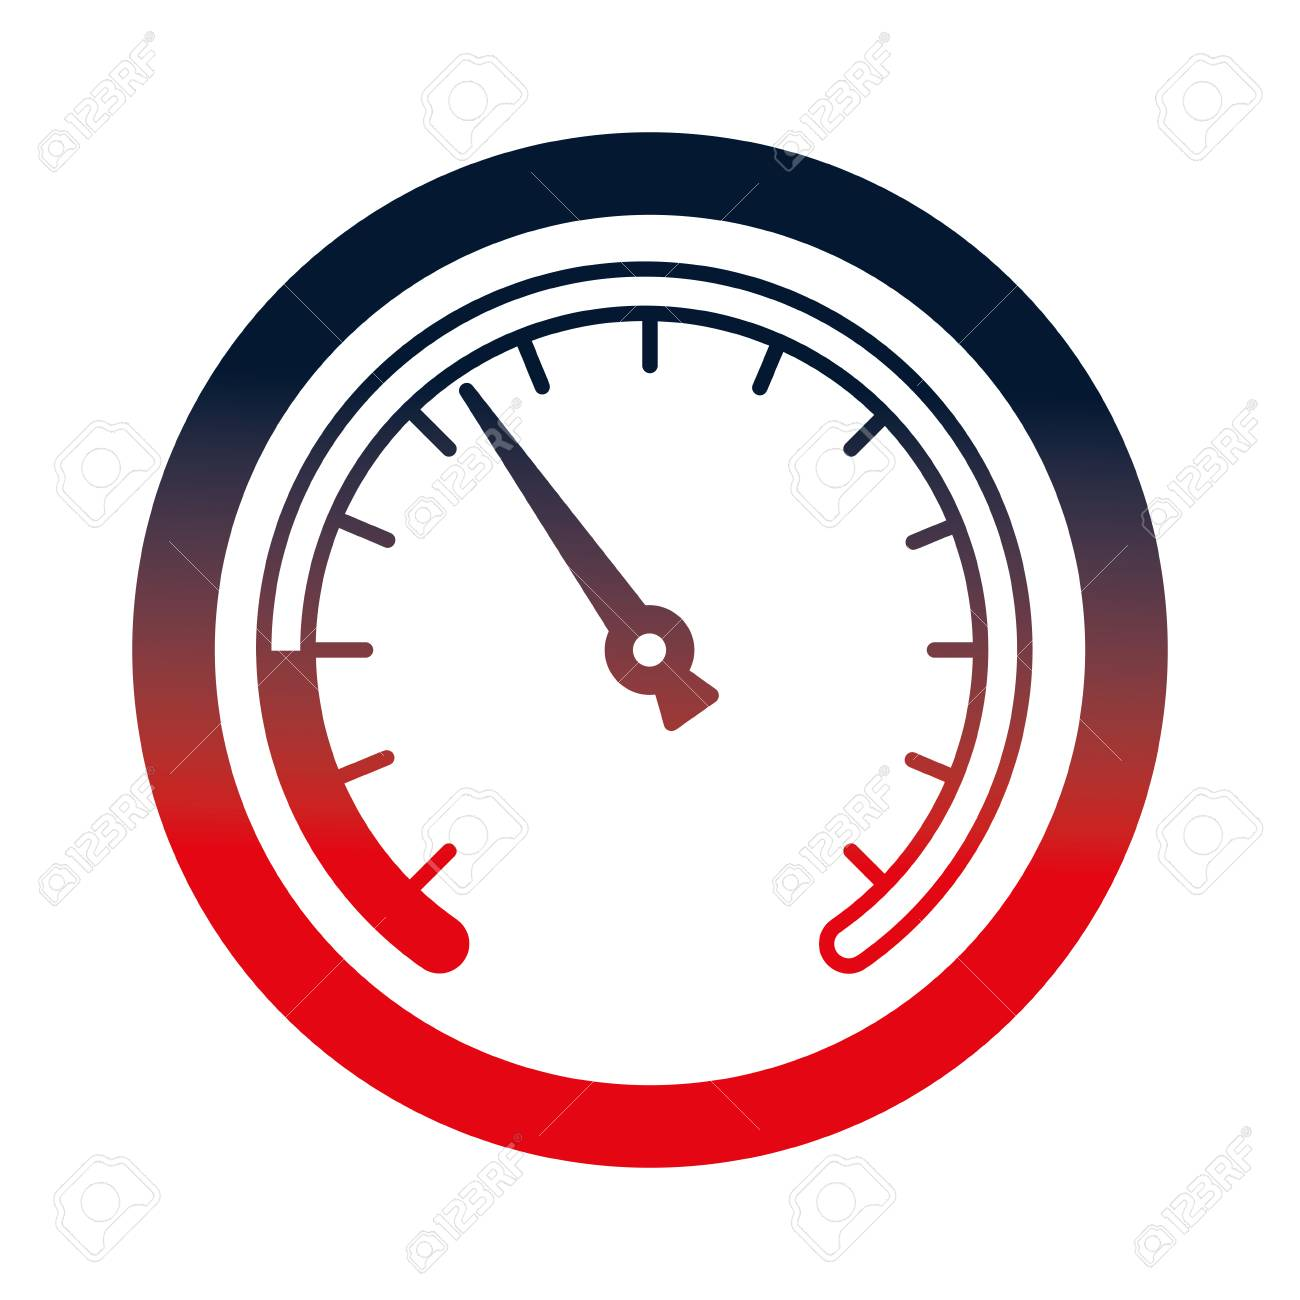 speed gauge isolated icon vector illustration design - 112070748